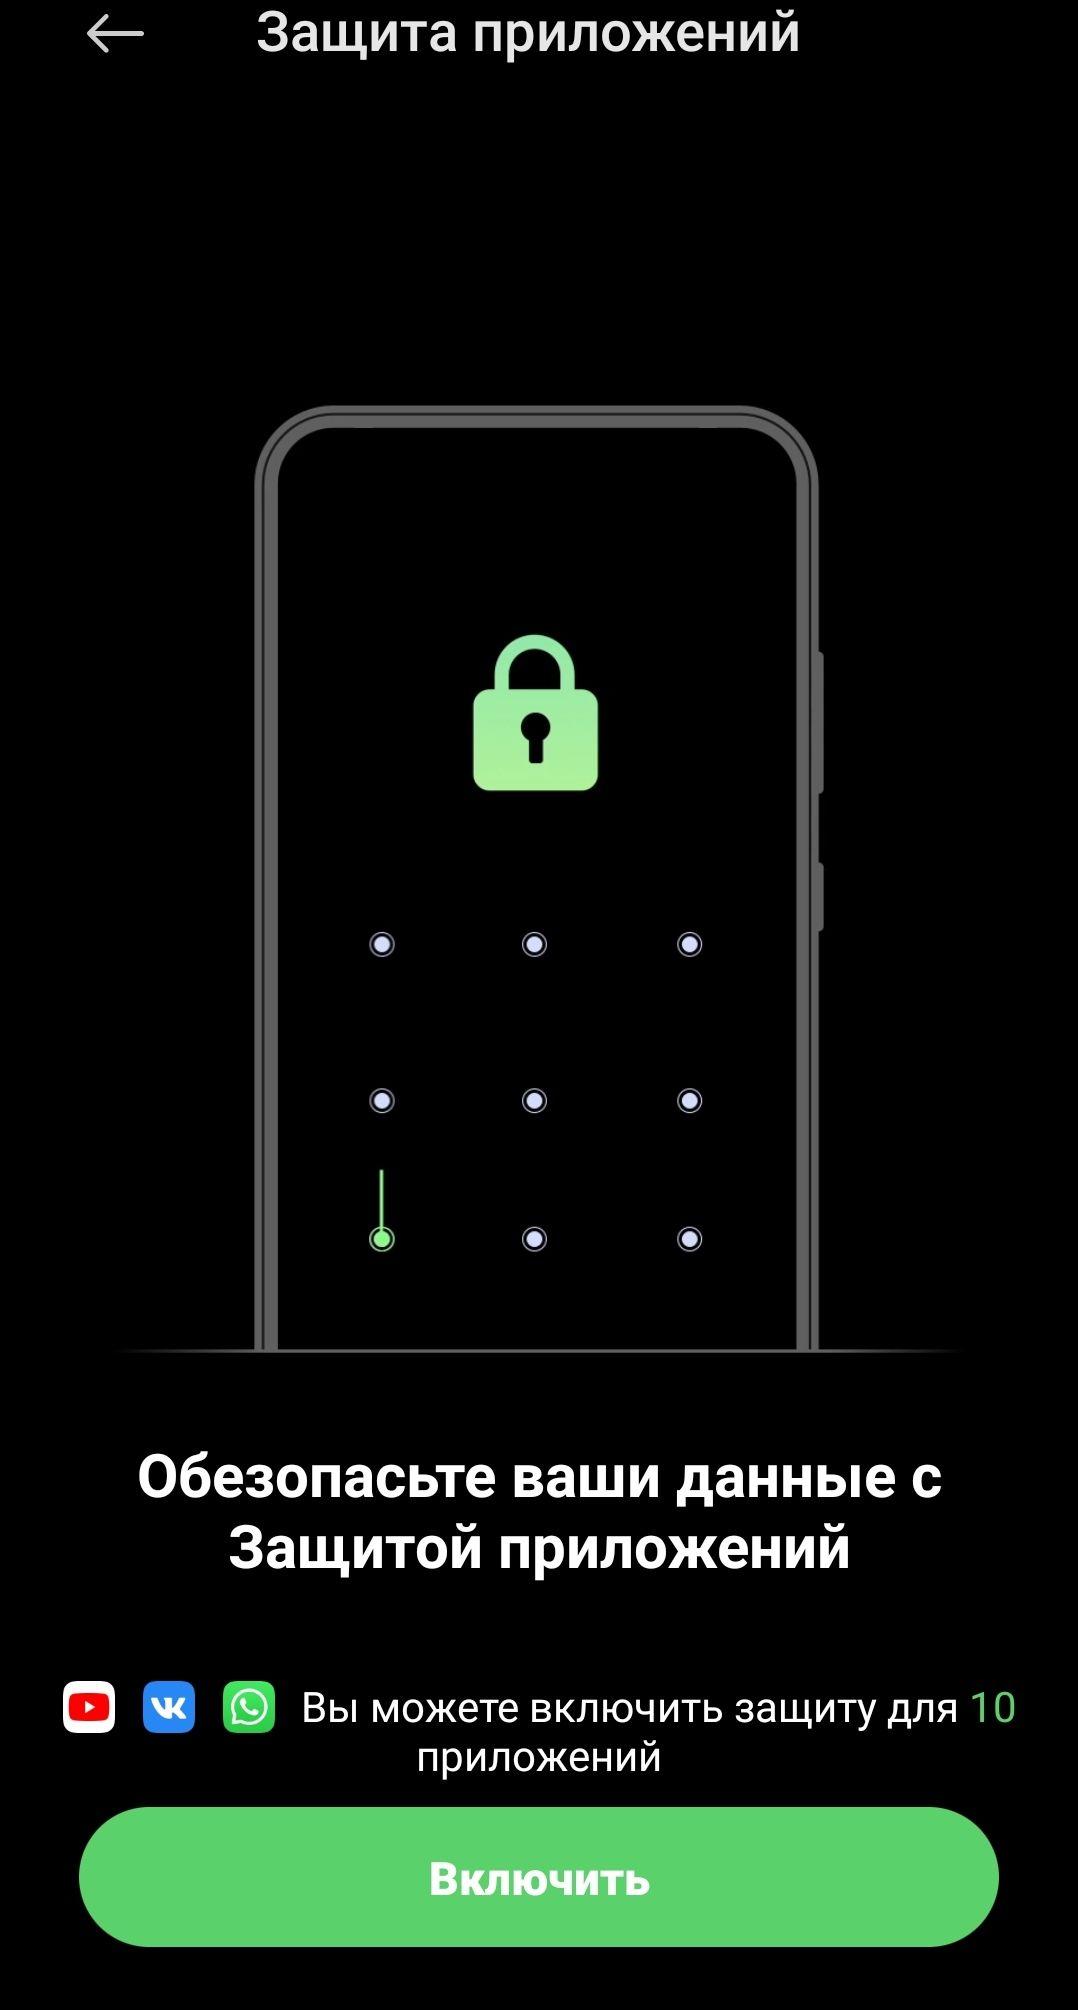 https://s3-us-west-2.amazonaws.com/secure.notion-static.com/8e0d8bb8-b14e-419c-9092-40d1bb705878/IMG_20201208_191212.jpg